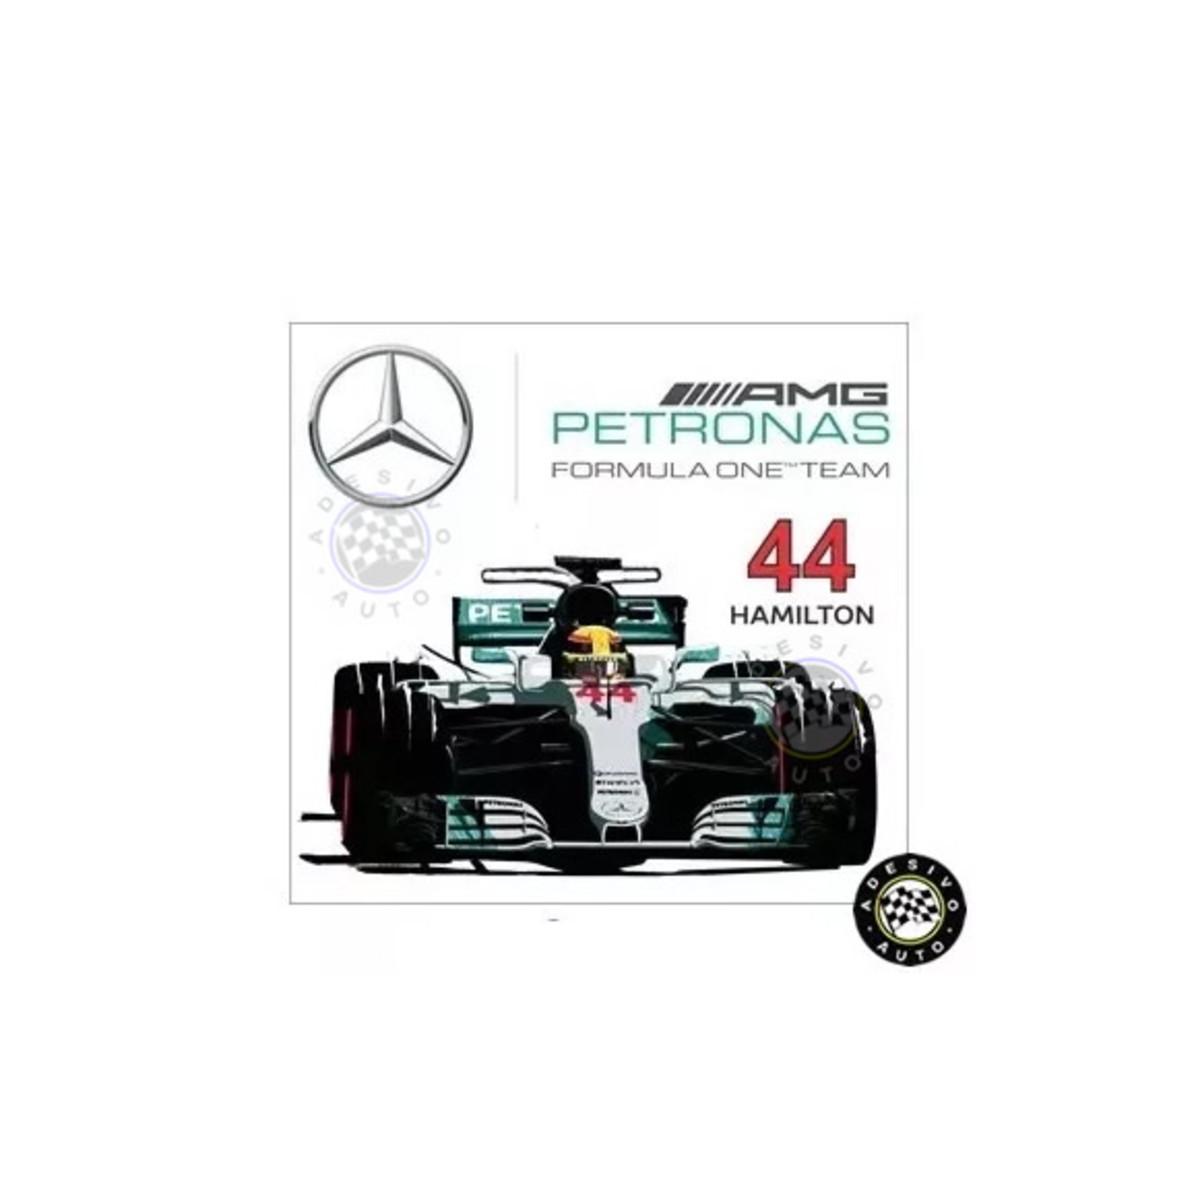 Adesivo Lewis Hamilton 44 Mercedes Petronas F1 W08 Formula 1 no Elo7 ... fab4763766581